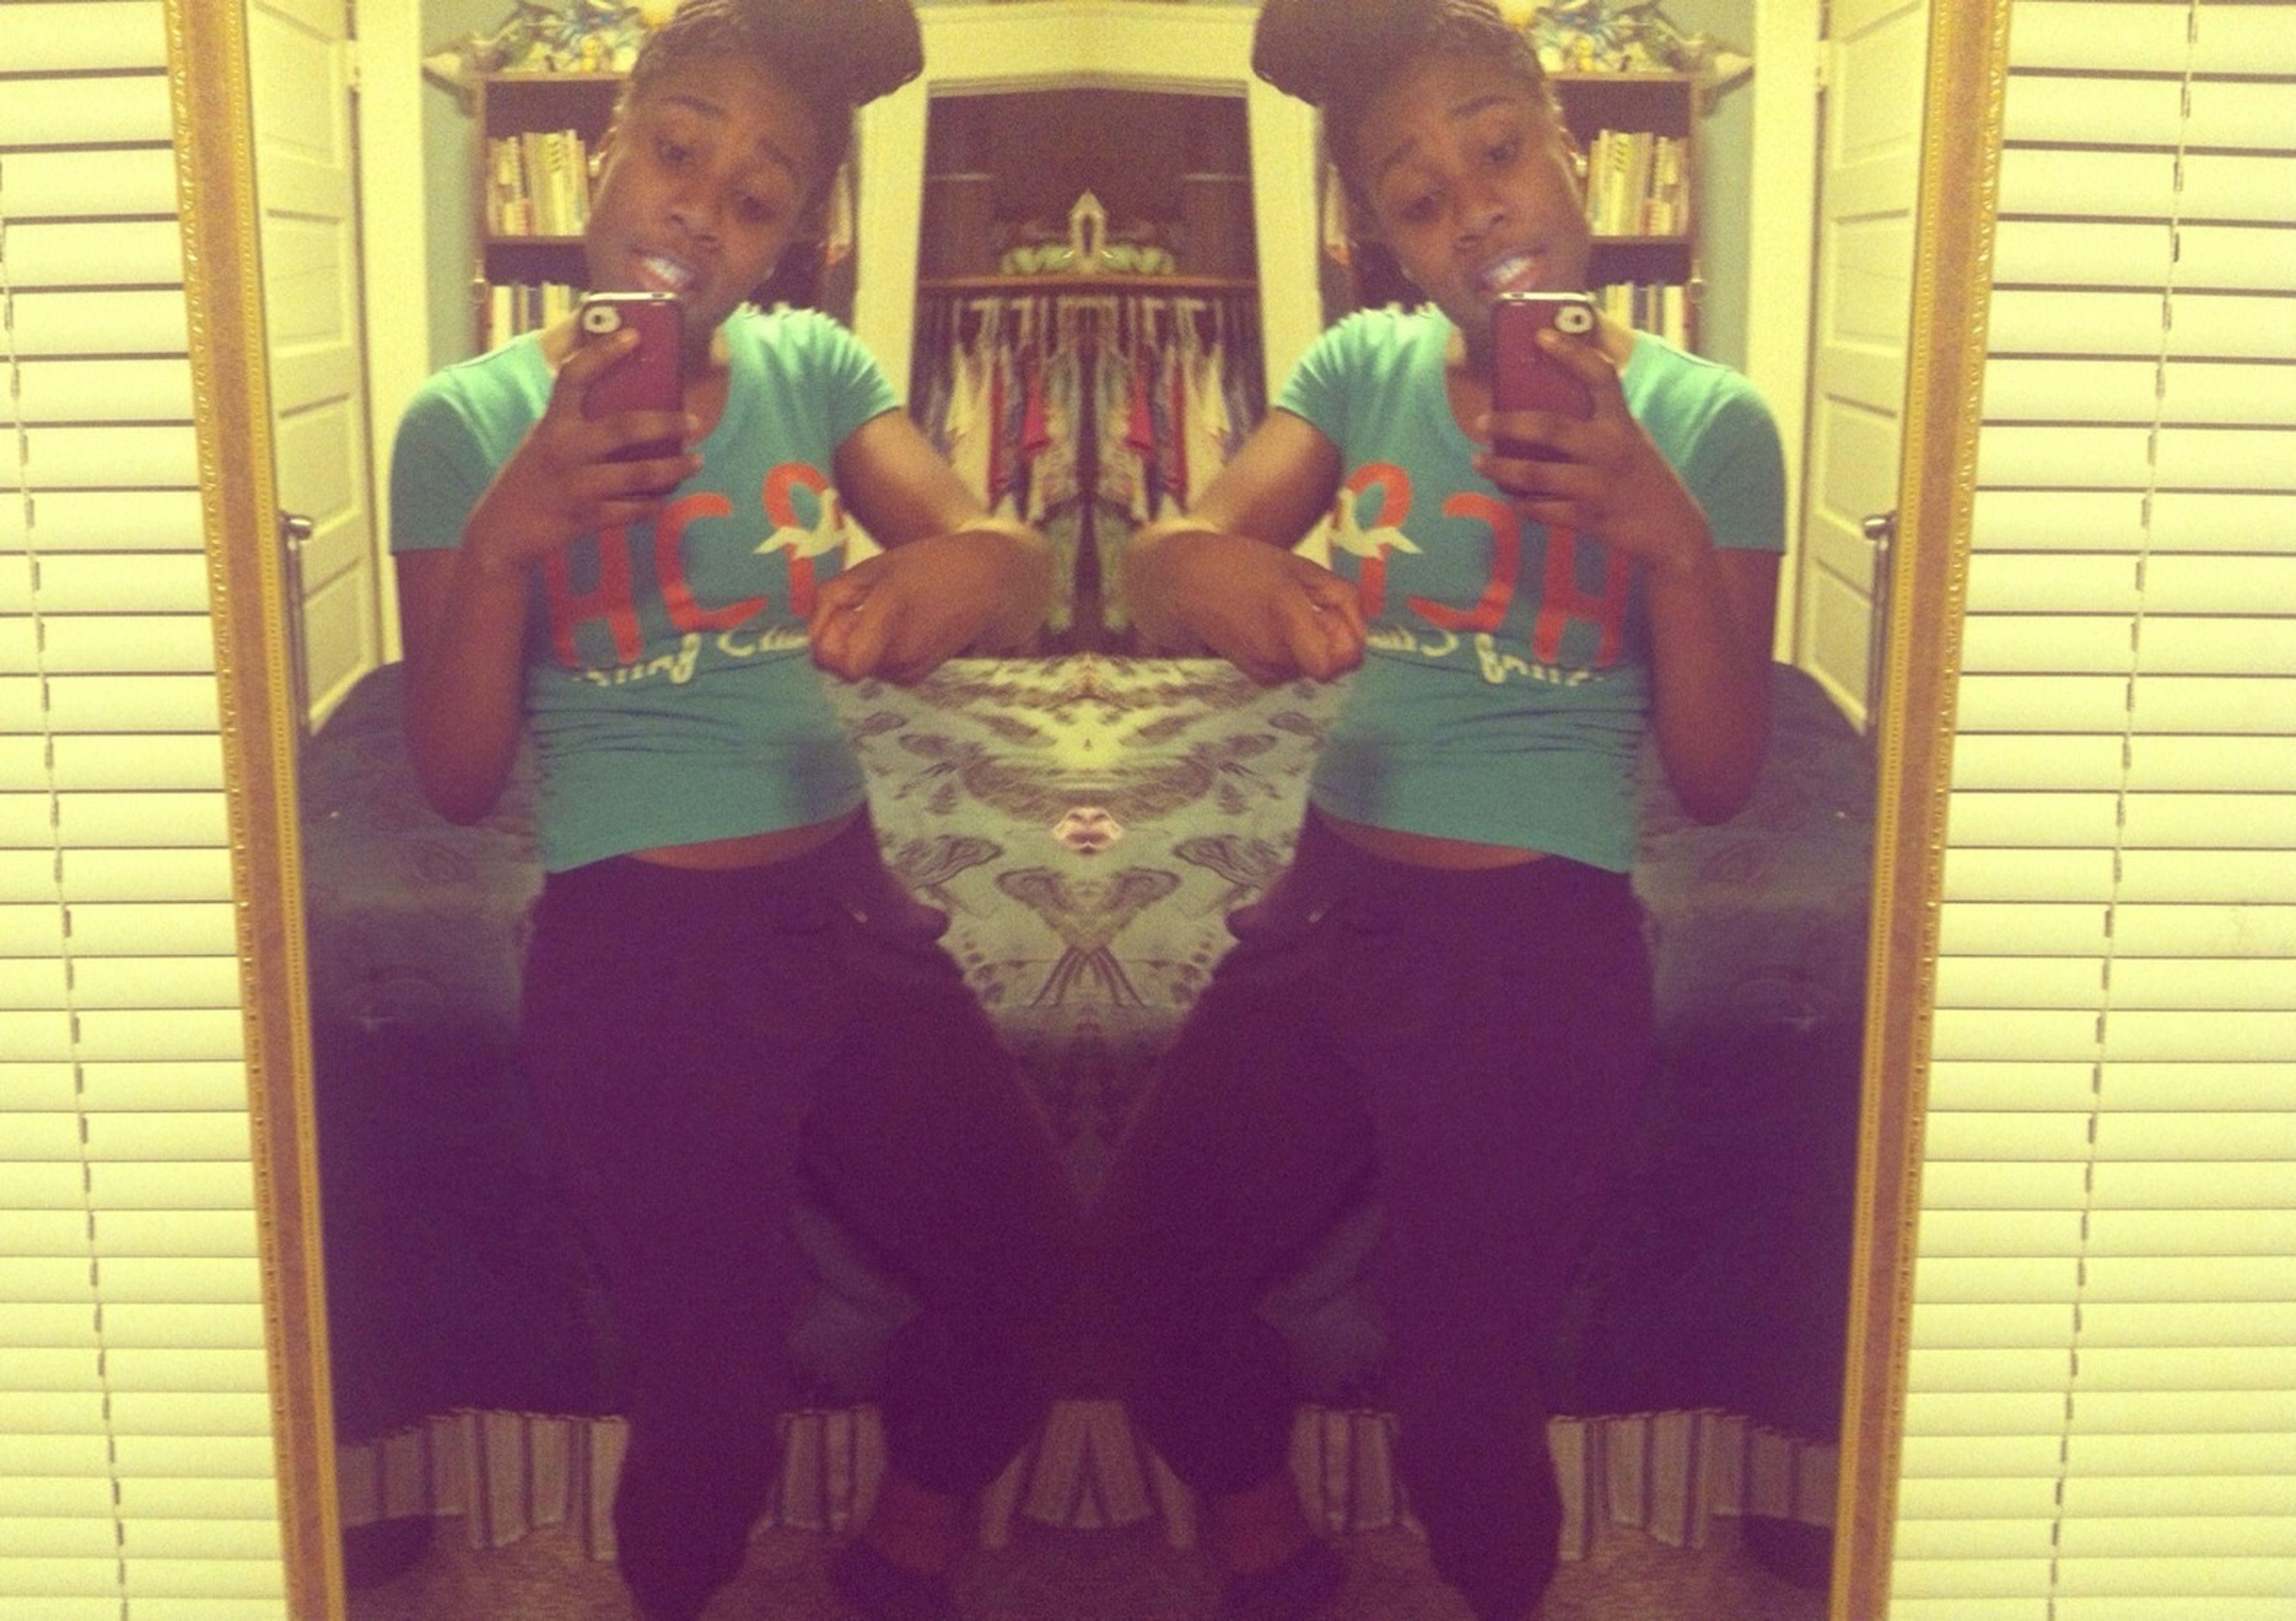 Mee & The Twin